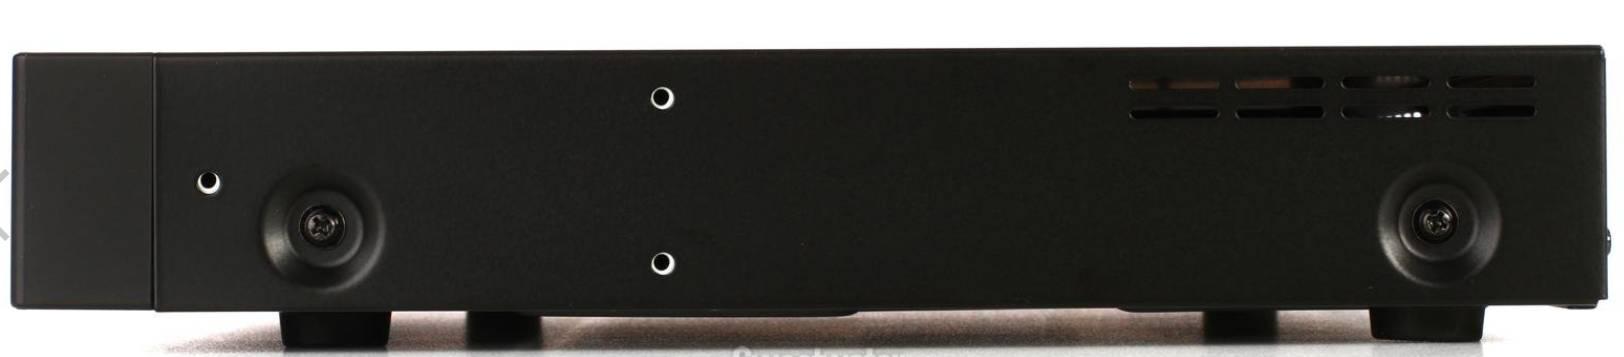 Denon Pro DN500BDMKIIXUS Blu-Ray, DVD and CD/SD/USB Player Product Image 7